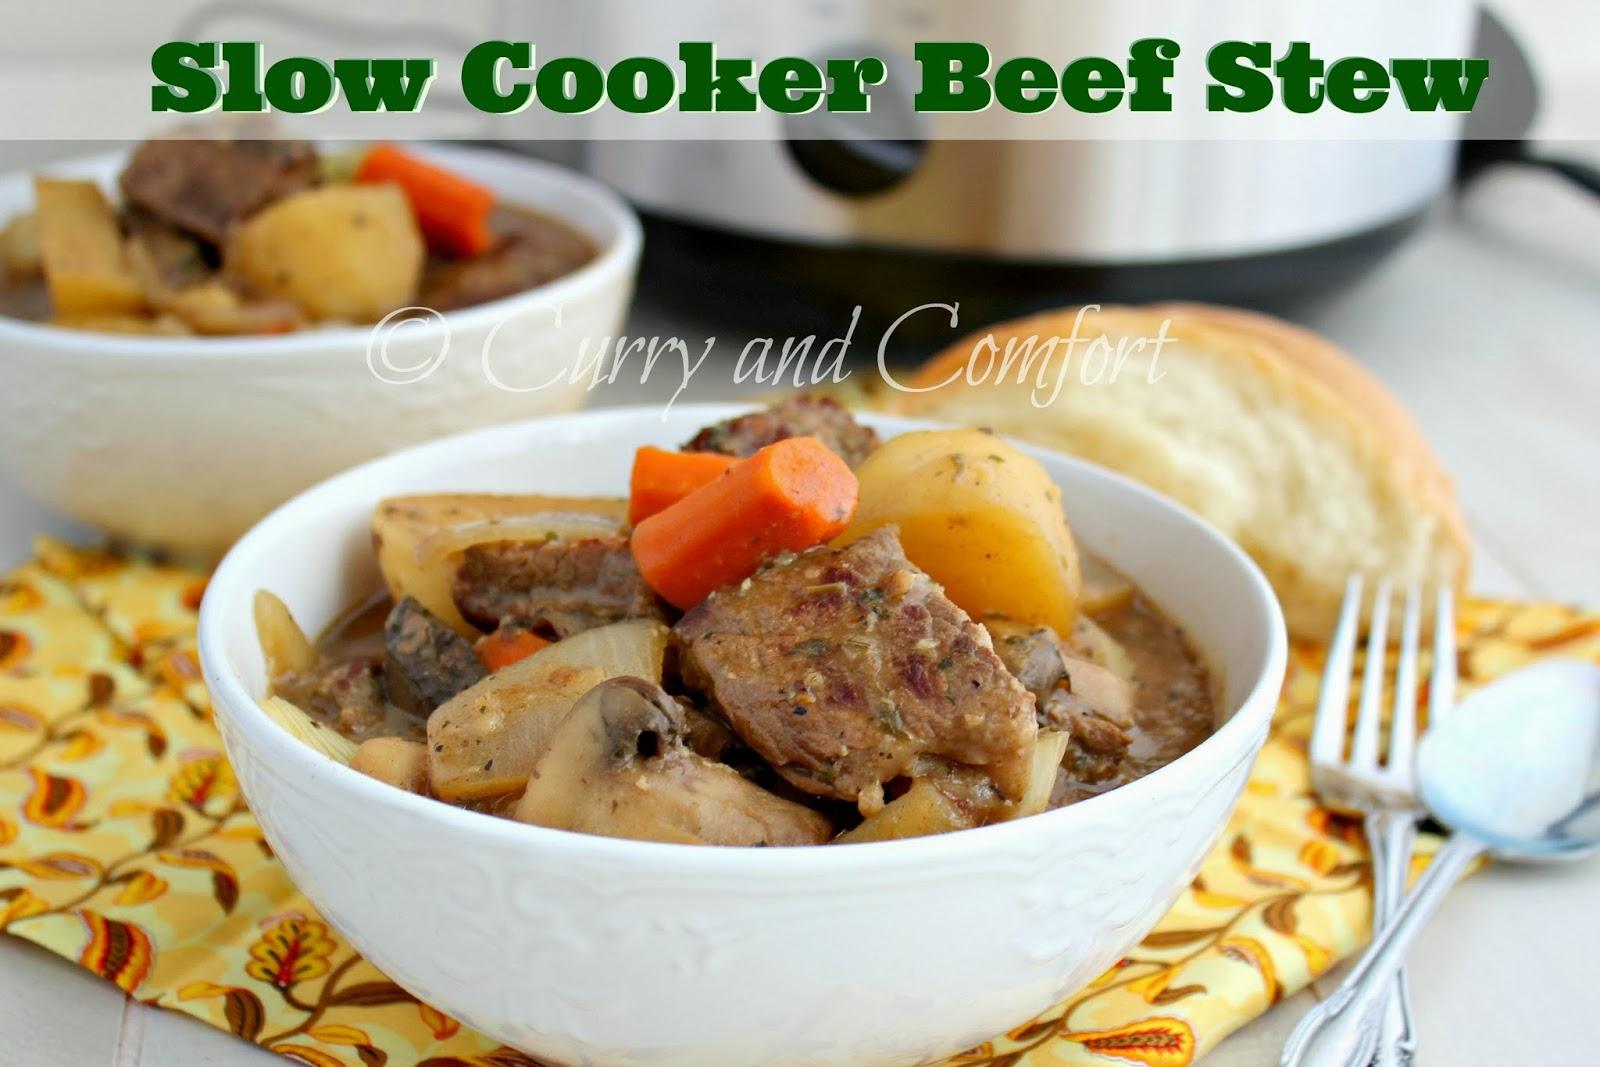 Kitchen Simmer: Beef Stew in the Slow Cooker #crocktoberfest2013